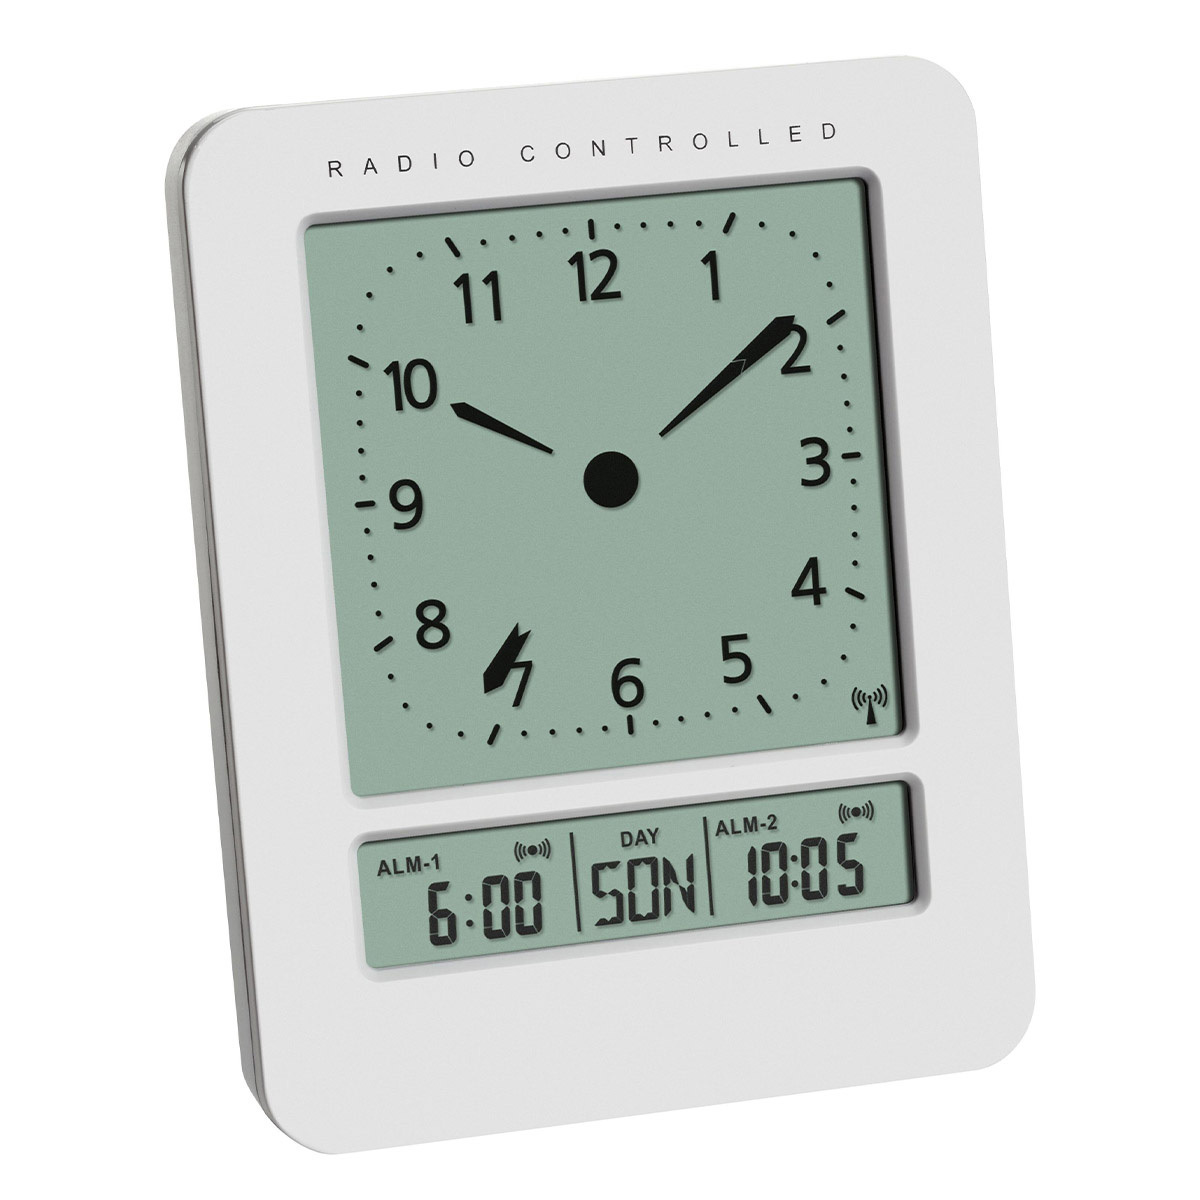 60-2530-02-digitaler-funk-wecker-mit-analogem-zifferblatt-temperatur-1200x1200px.jpg